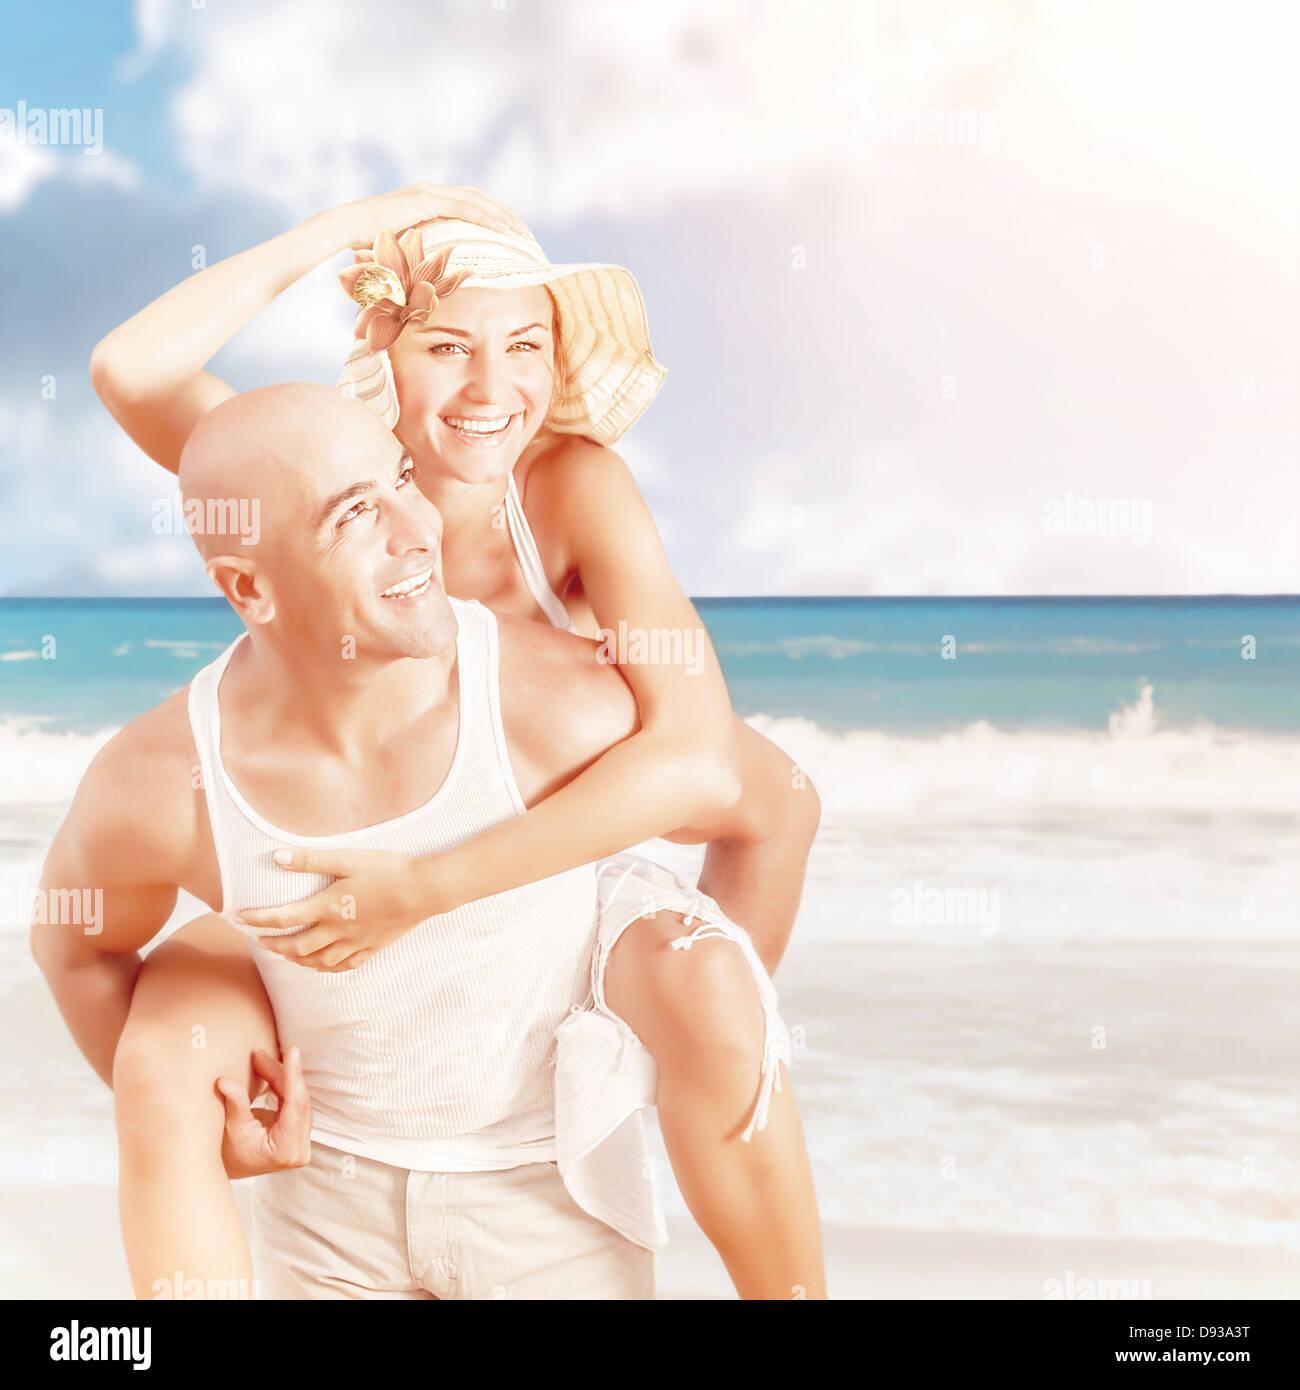 Happy couple on the beach, handsome man piggy back attractive woman, romantic date on seashore, luxury summer resort - Stock Image